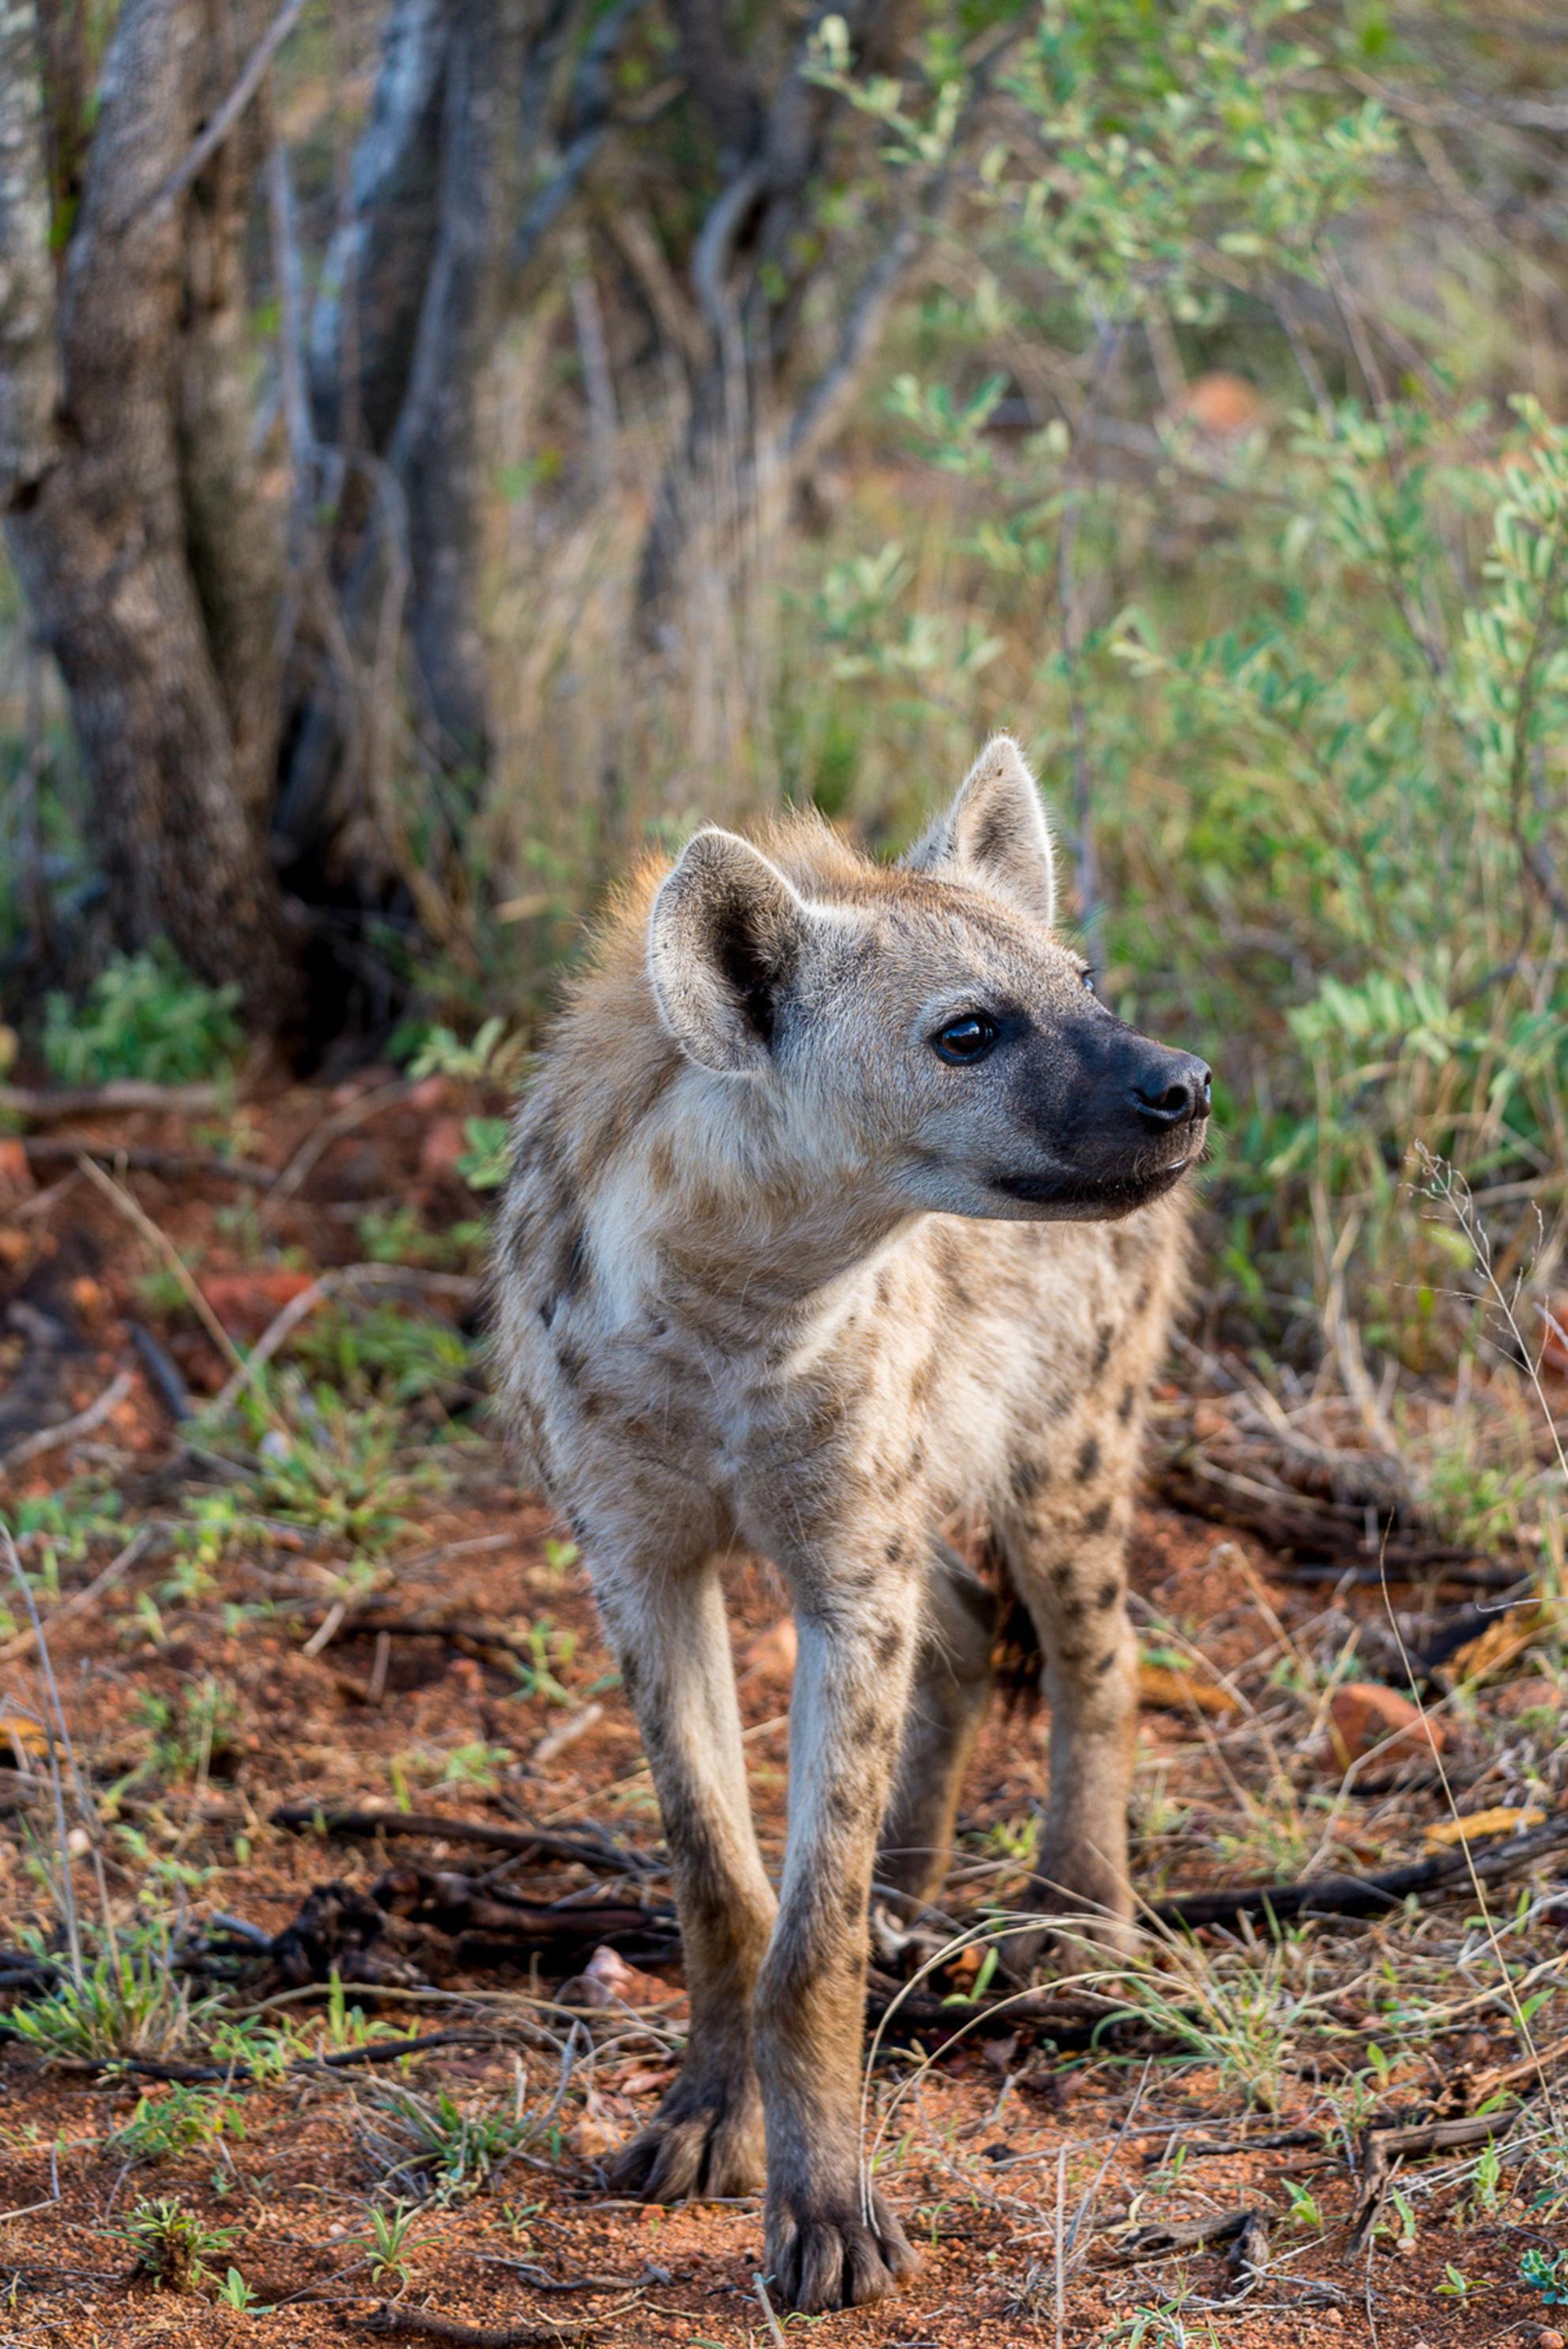 Gevlekte Hyena - - - foto door markdv77 op 14-07-2018 - deze foto bevat: hyena, zuid afrika, gevlekte hyena